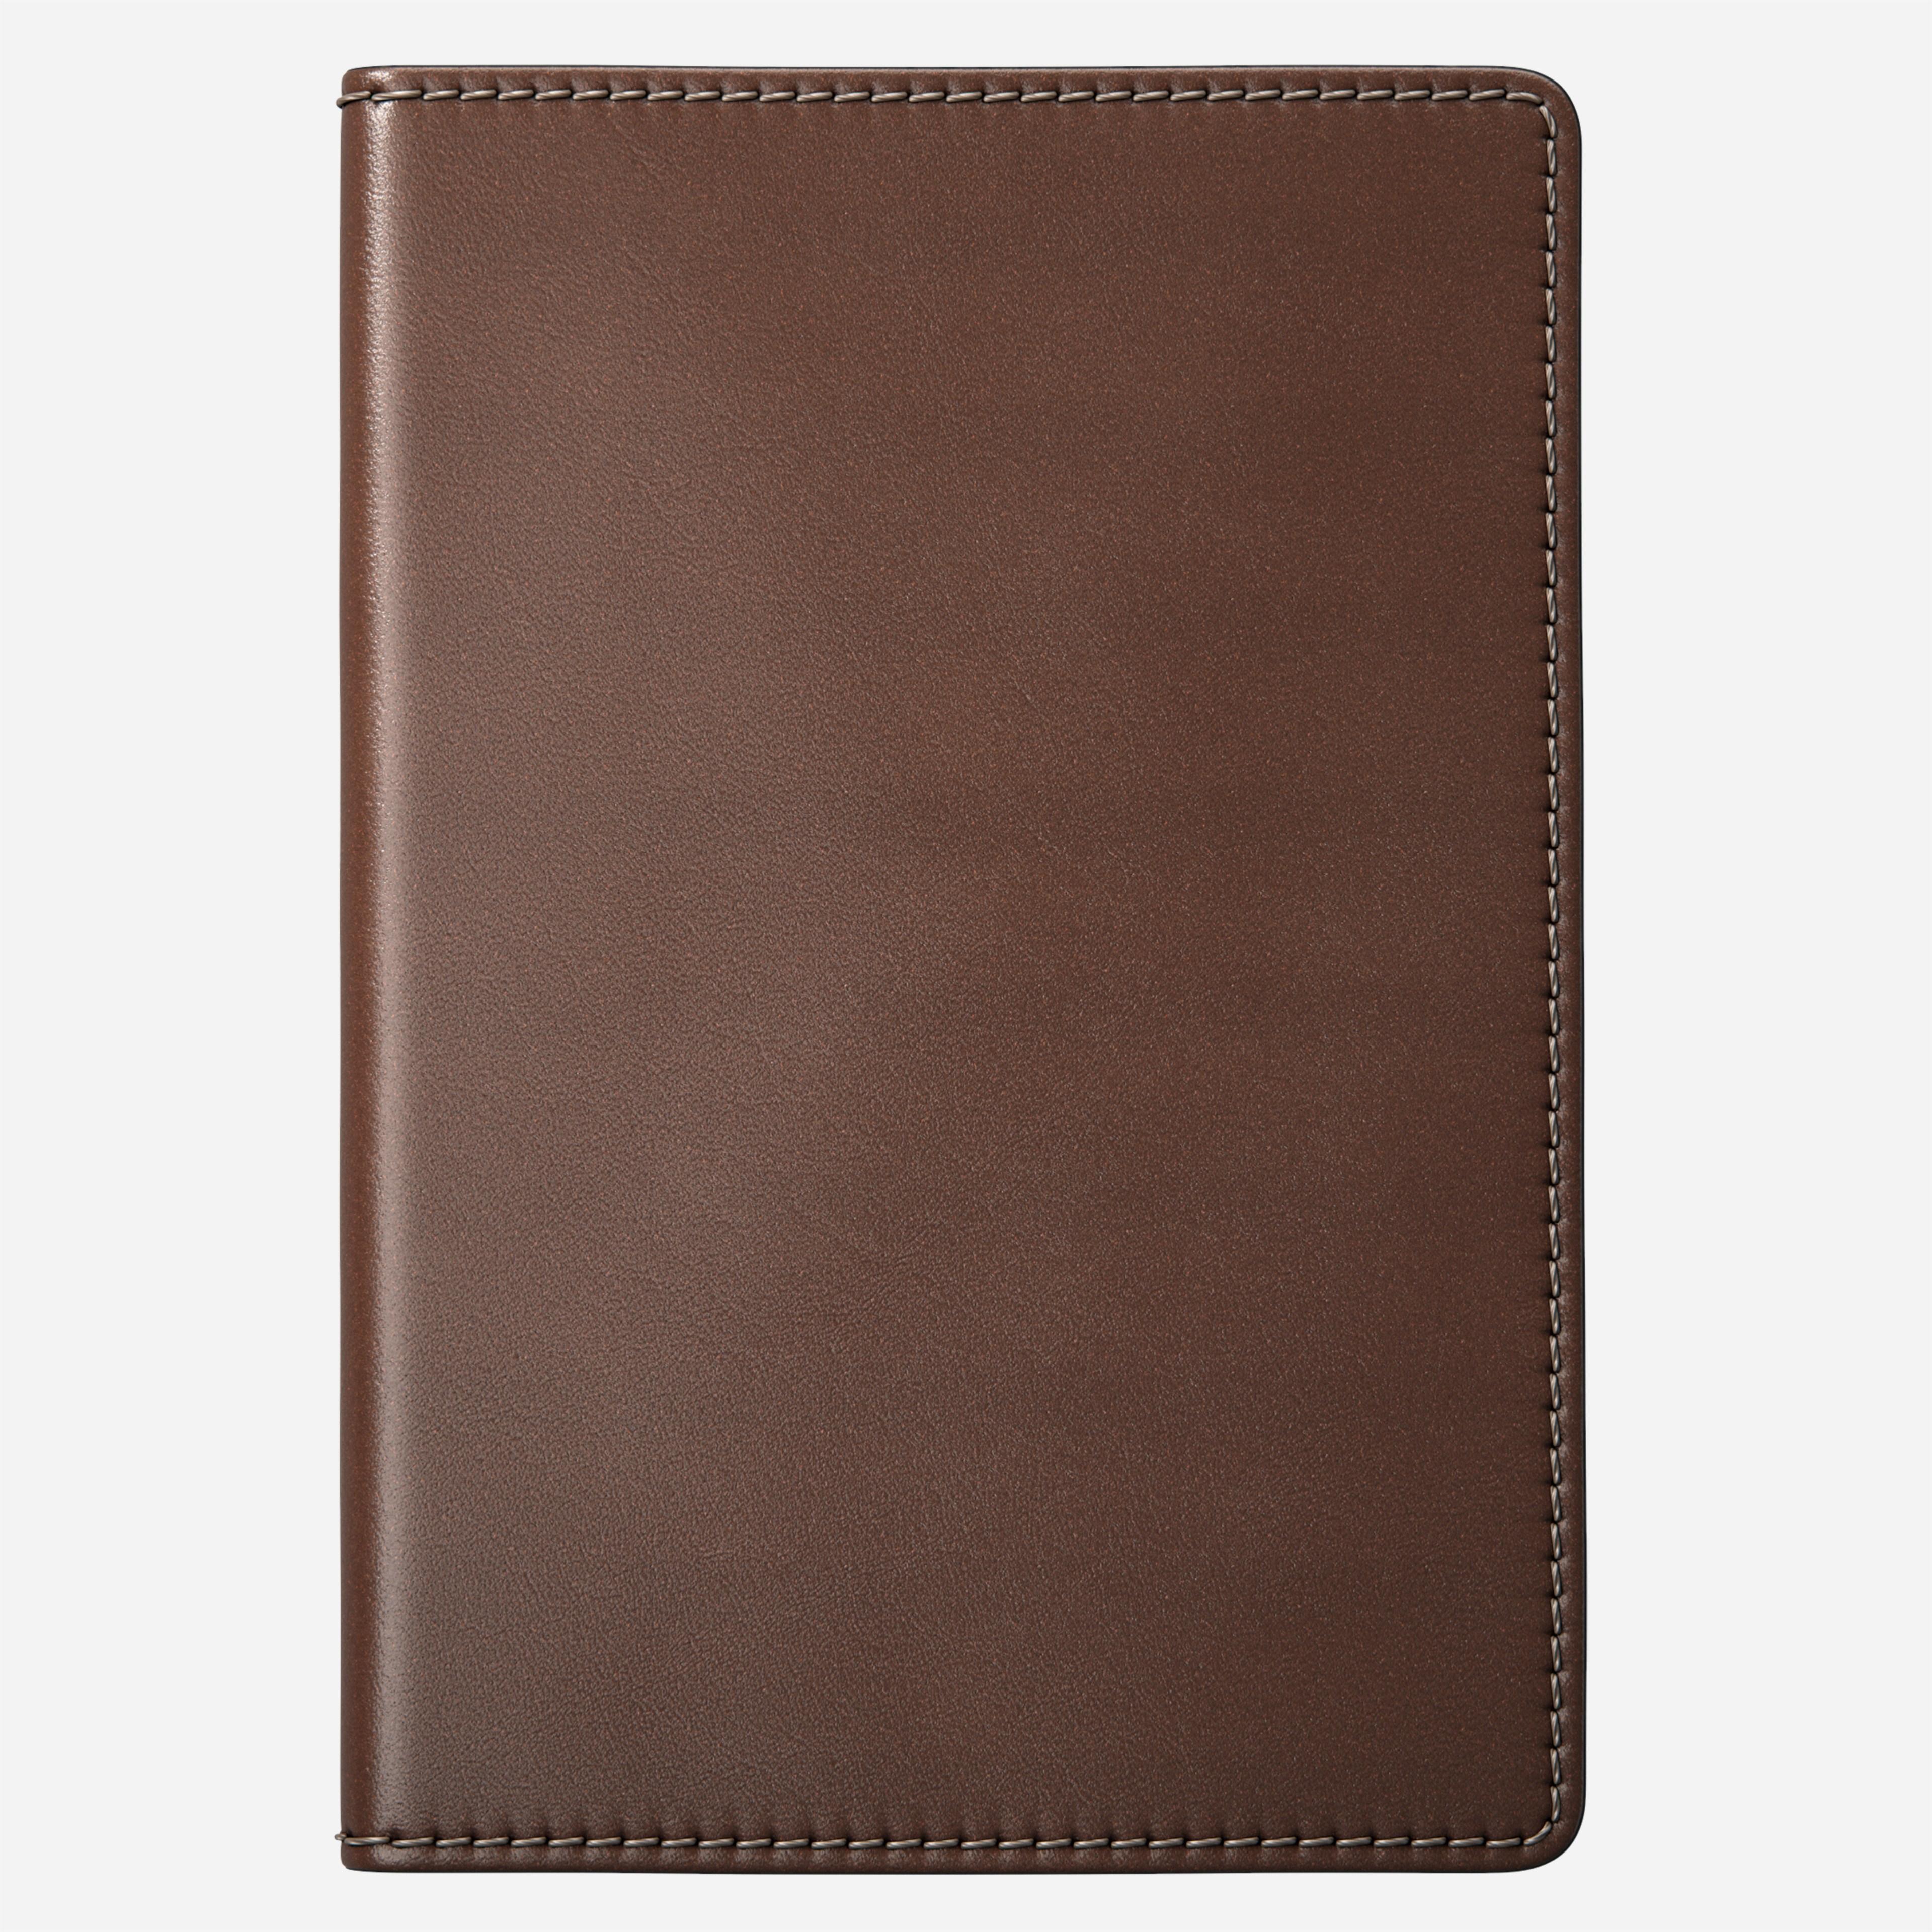 passport wallet traditional rustic brown